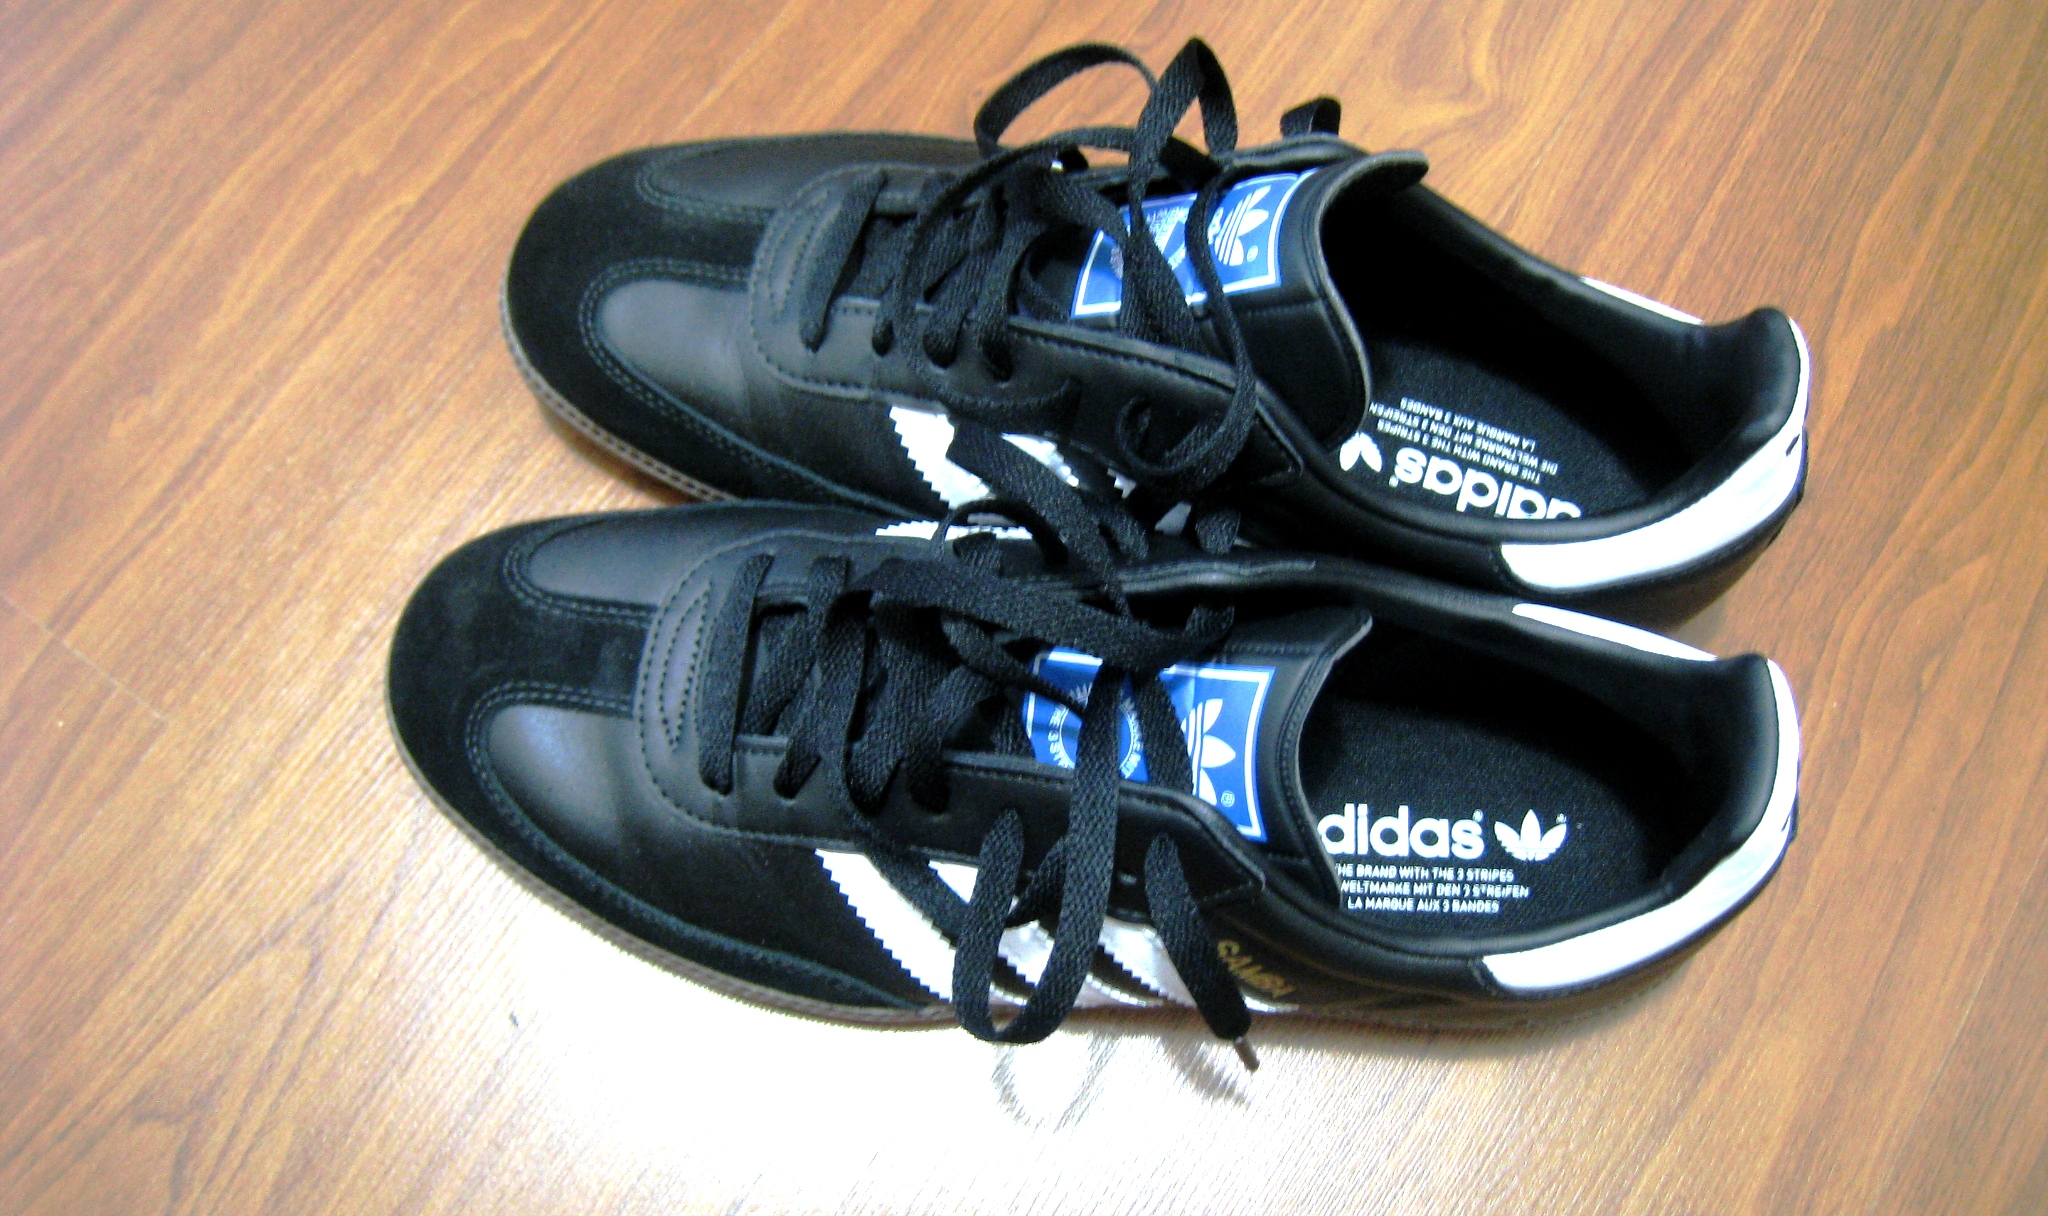 Adidas Samba Worn Adidas Samba in Classic Black